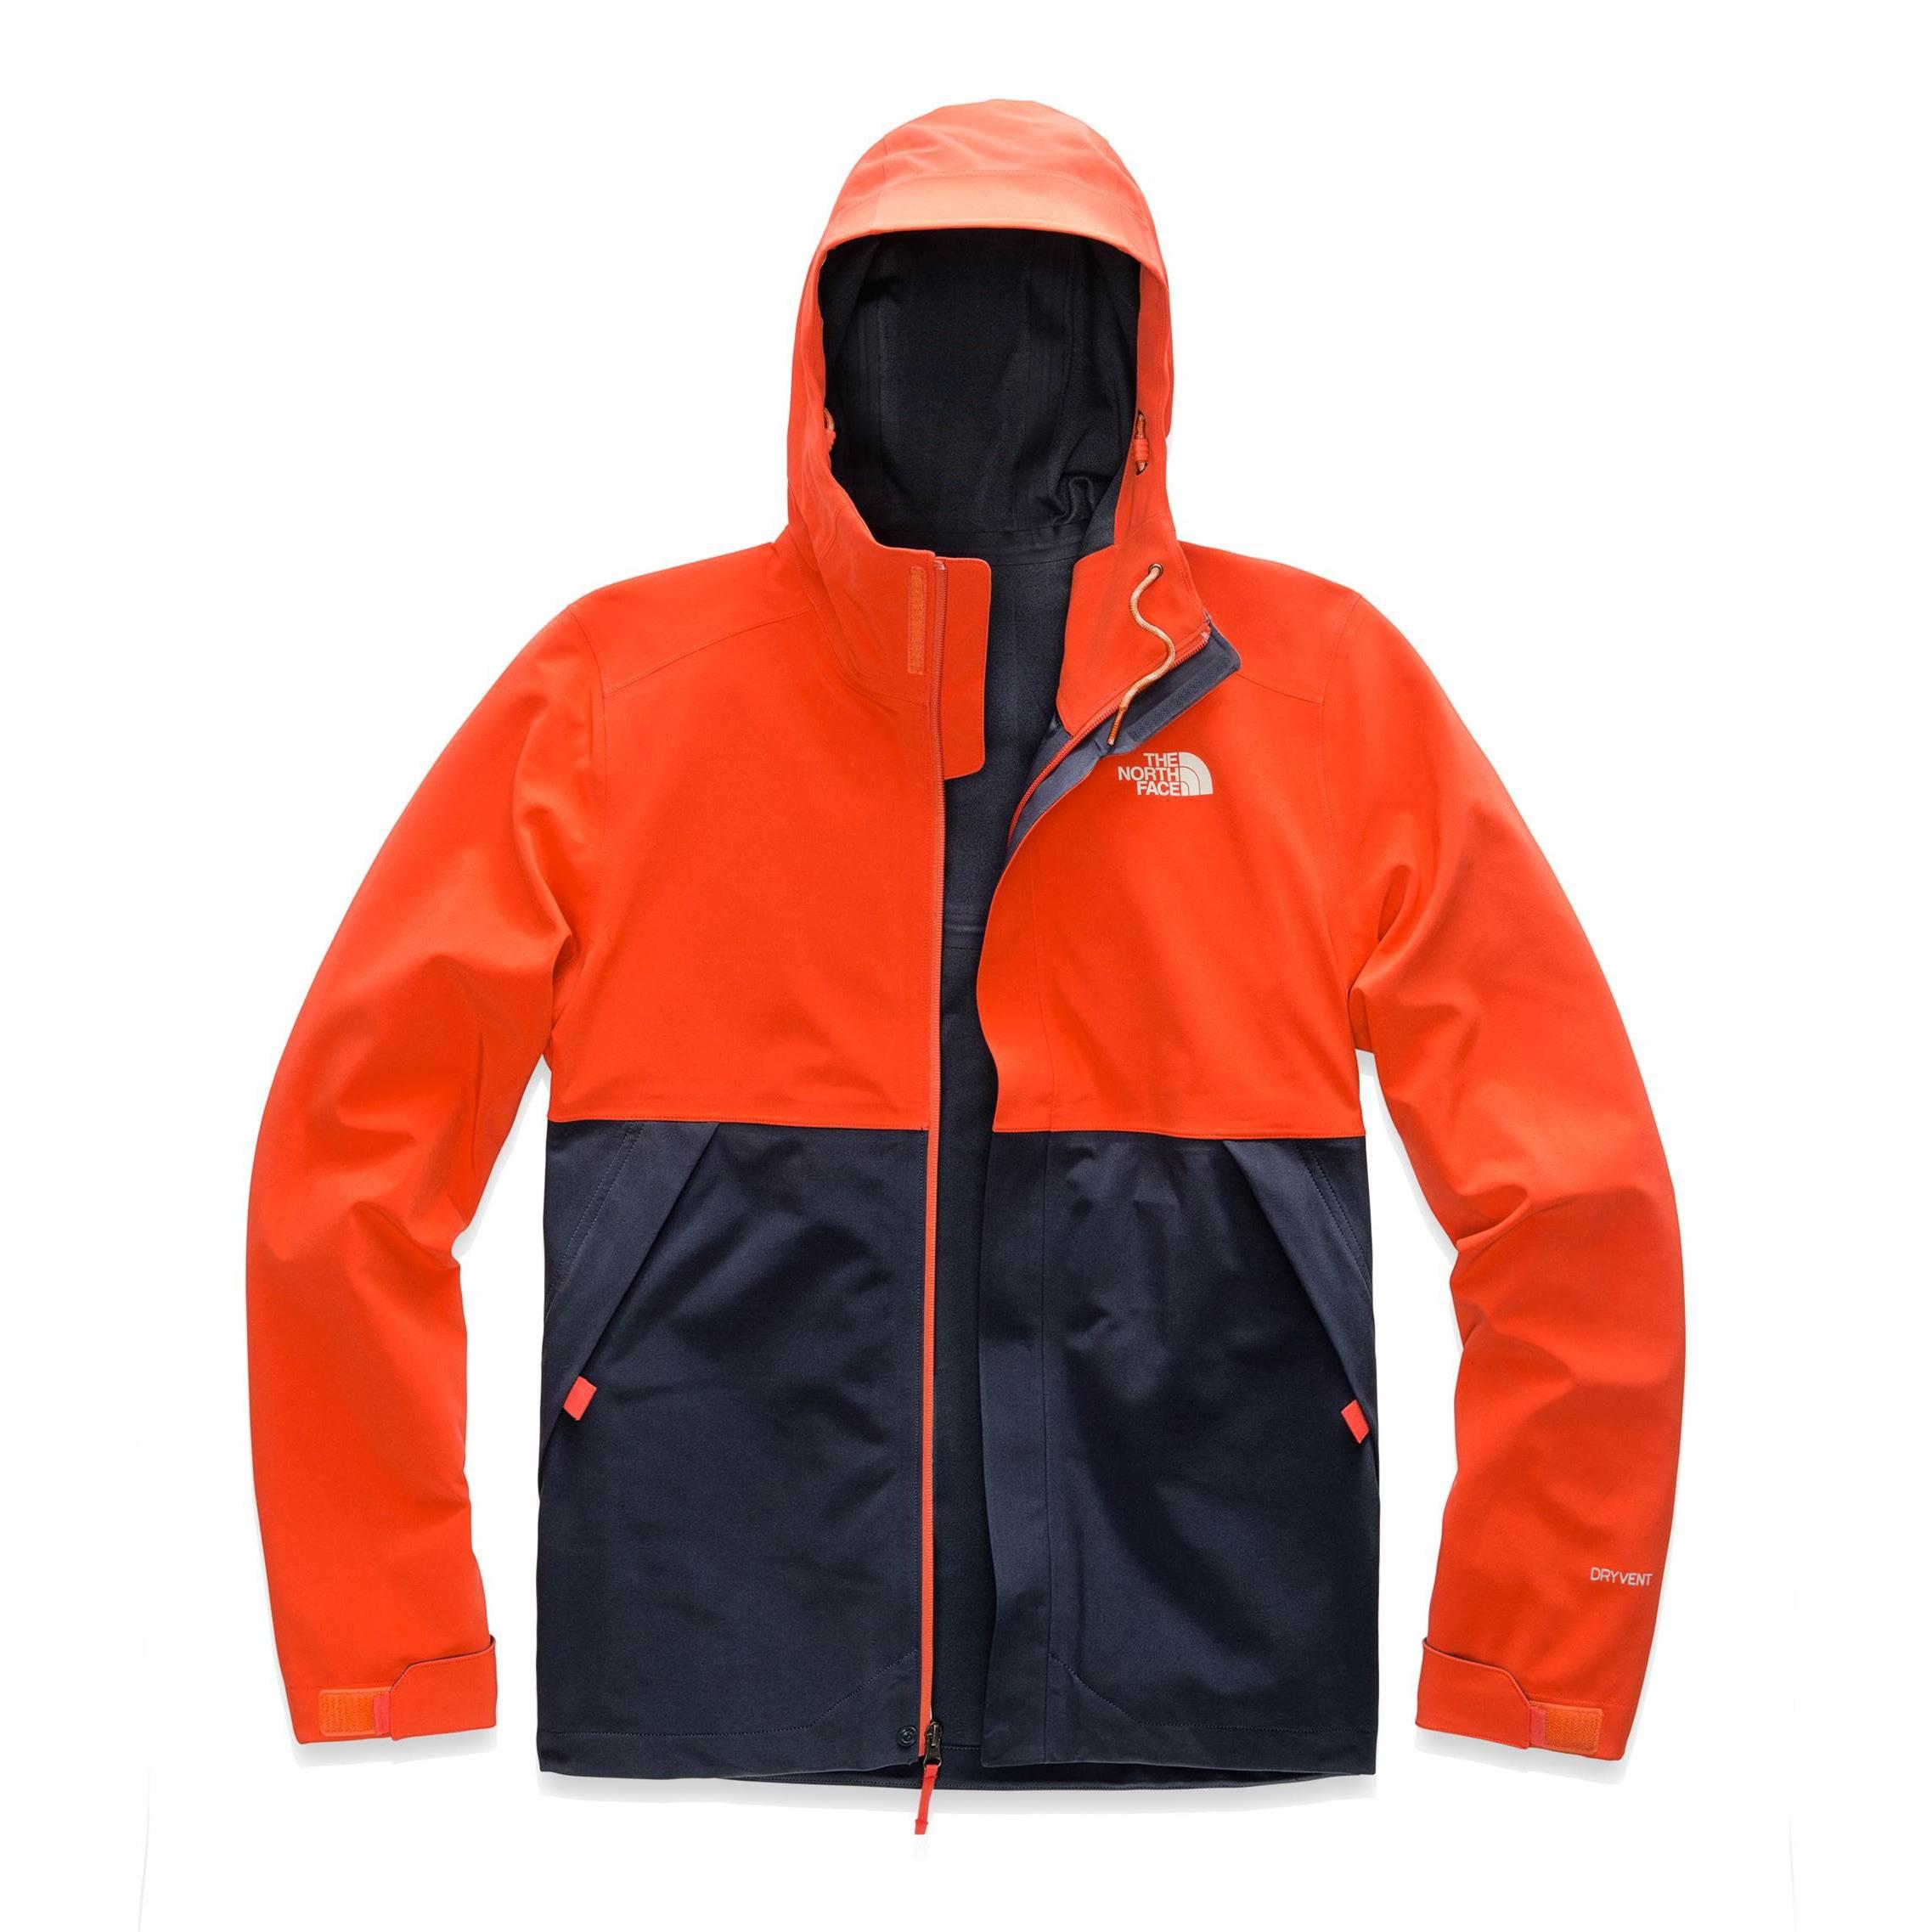 Apex Flex DryVent Jacket - Men's